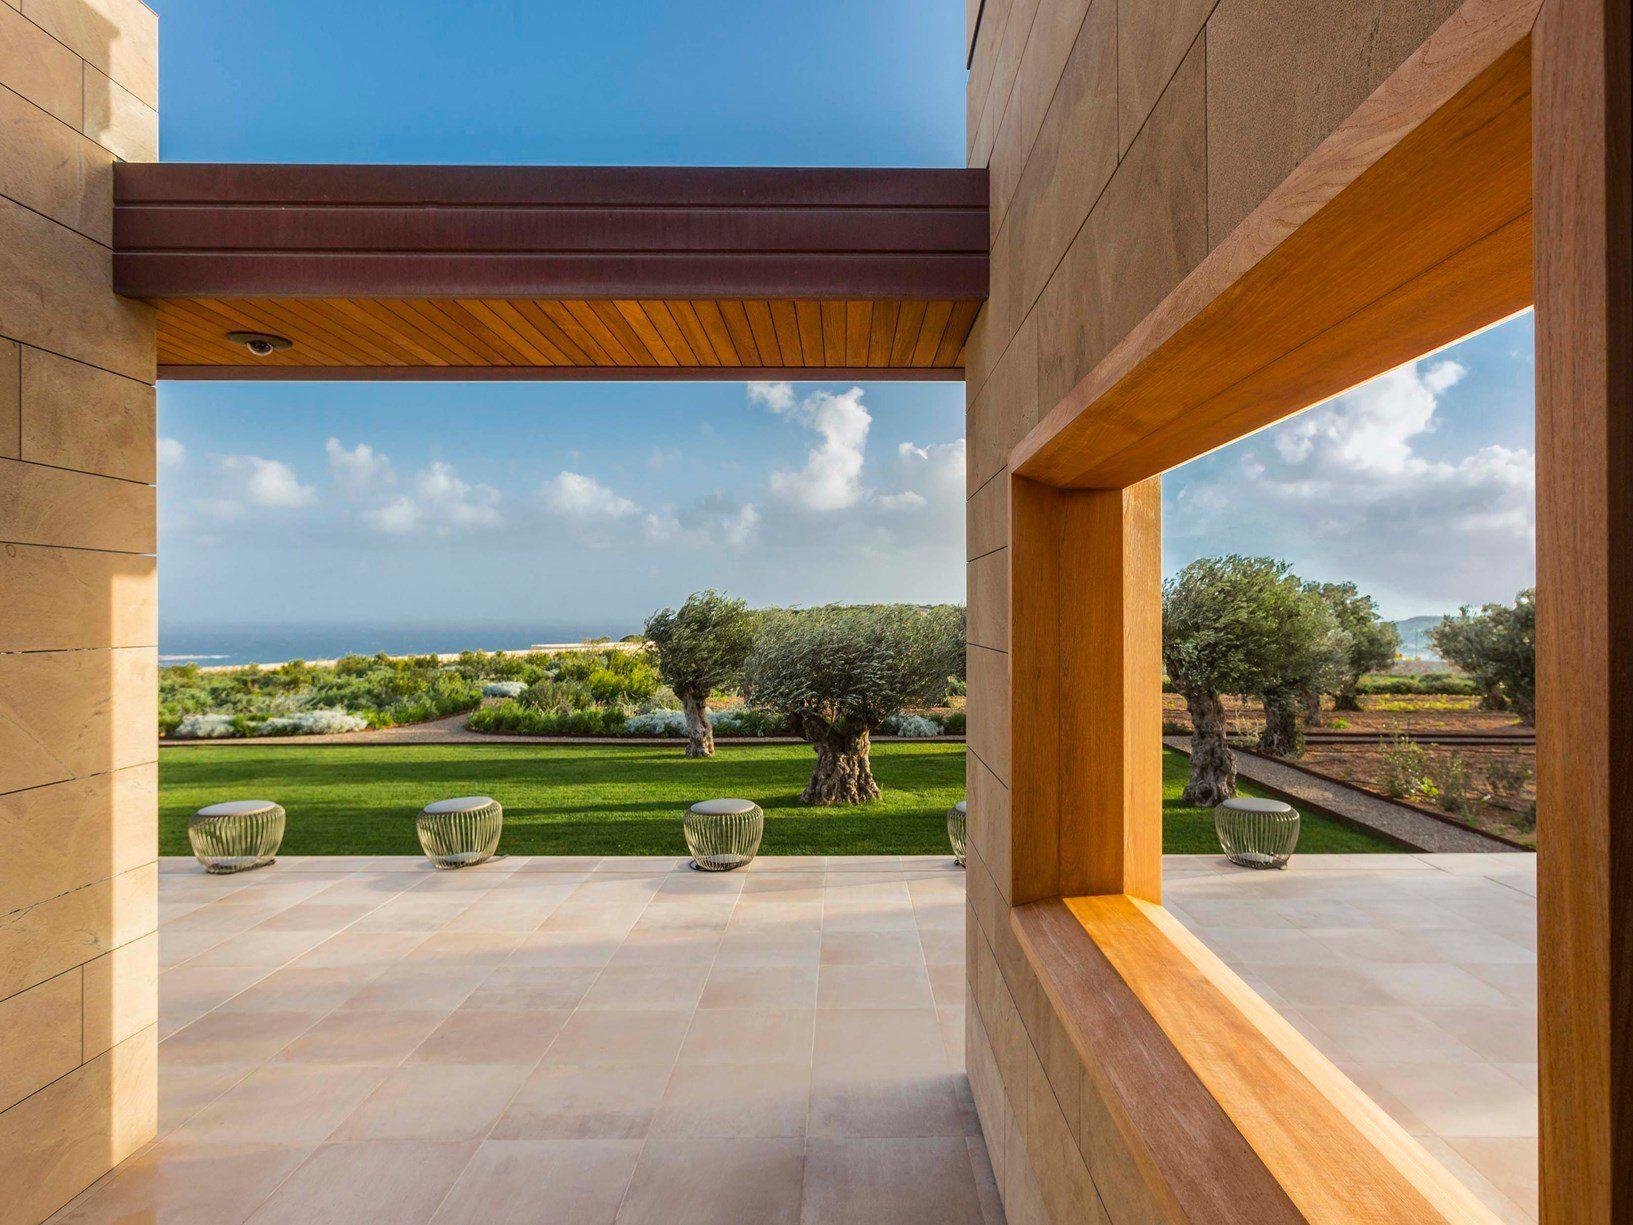 Prix Cheminee Exterieur Feu Chic Design a restyling of an house in maltacasalgrande padana